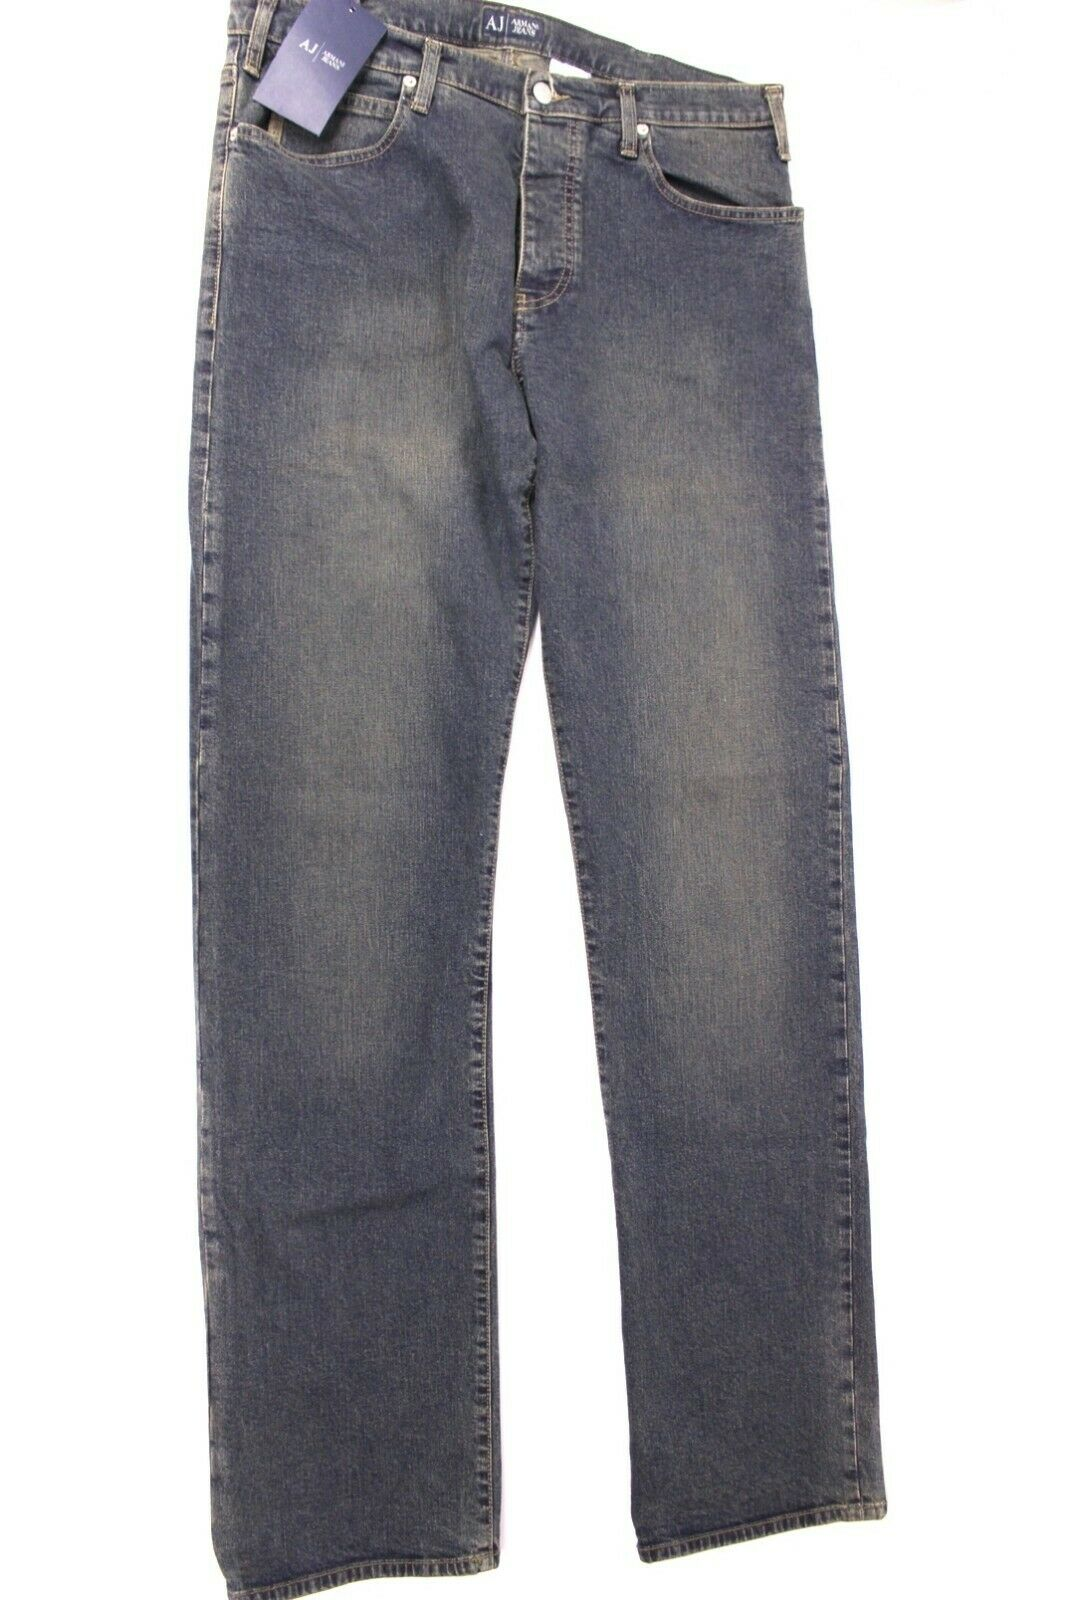 Armani Herren Jeans J21 Gr. 34 Blau Regular Waist Regular Stiefel Leg Comfort Fit